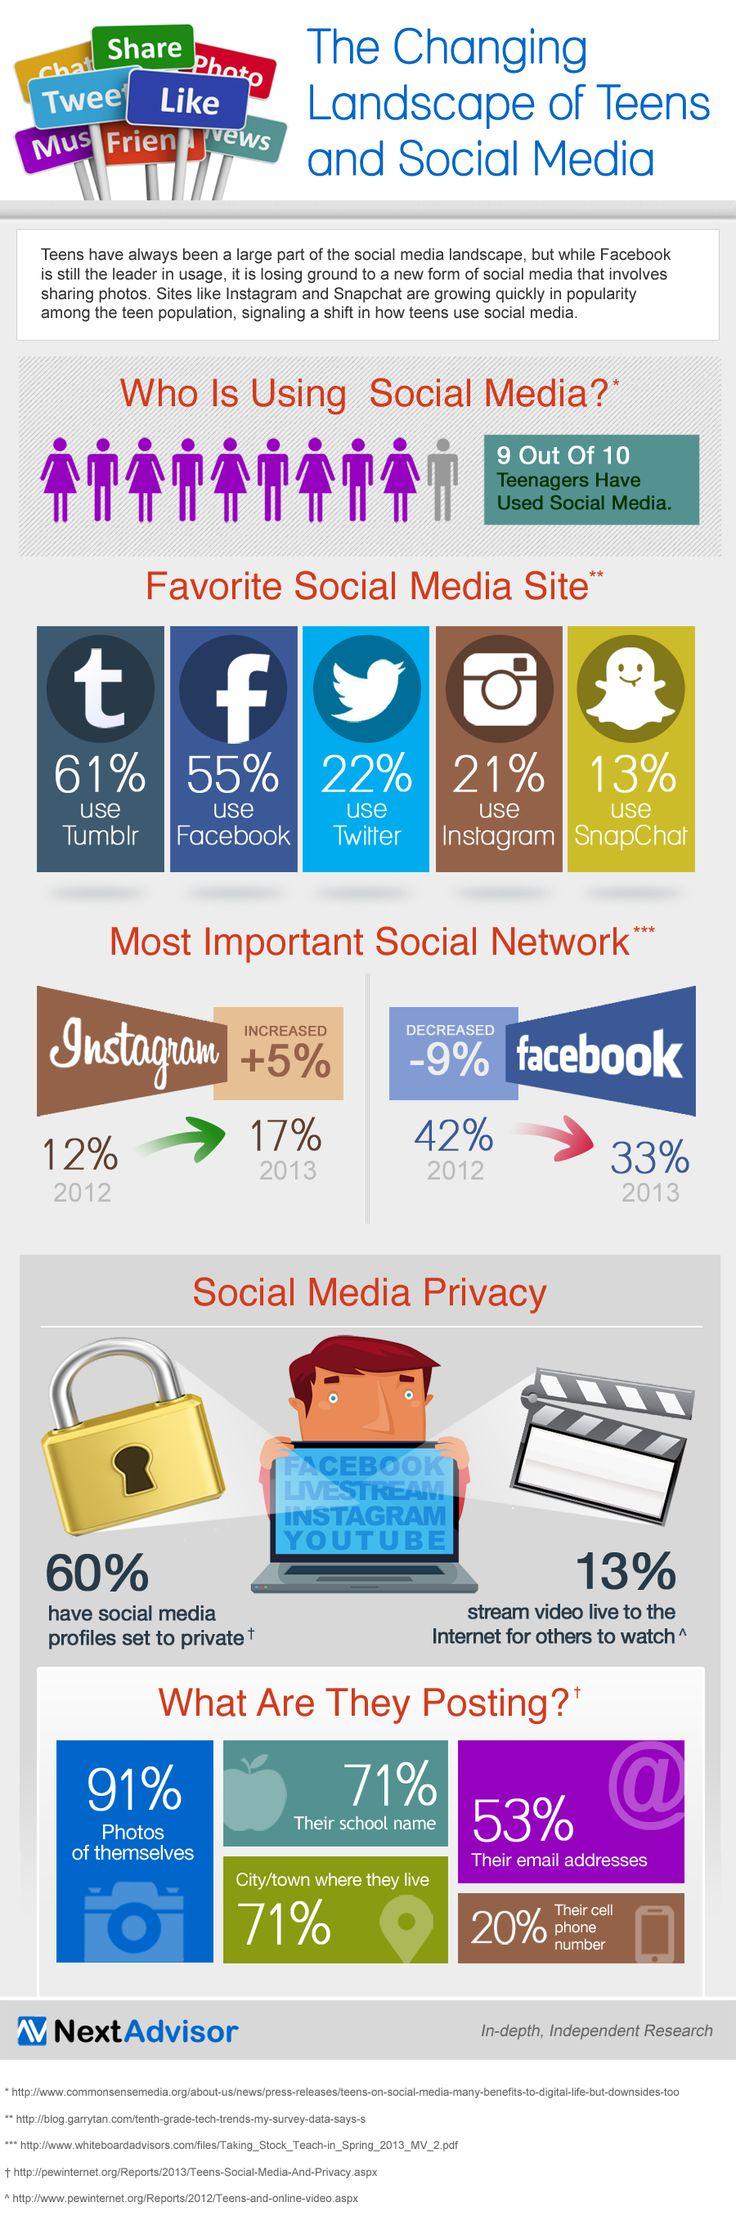 Tumblr, Facebook, Twitter, Instagram & Snapchat - How Teens Use Social Media. Infographic.